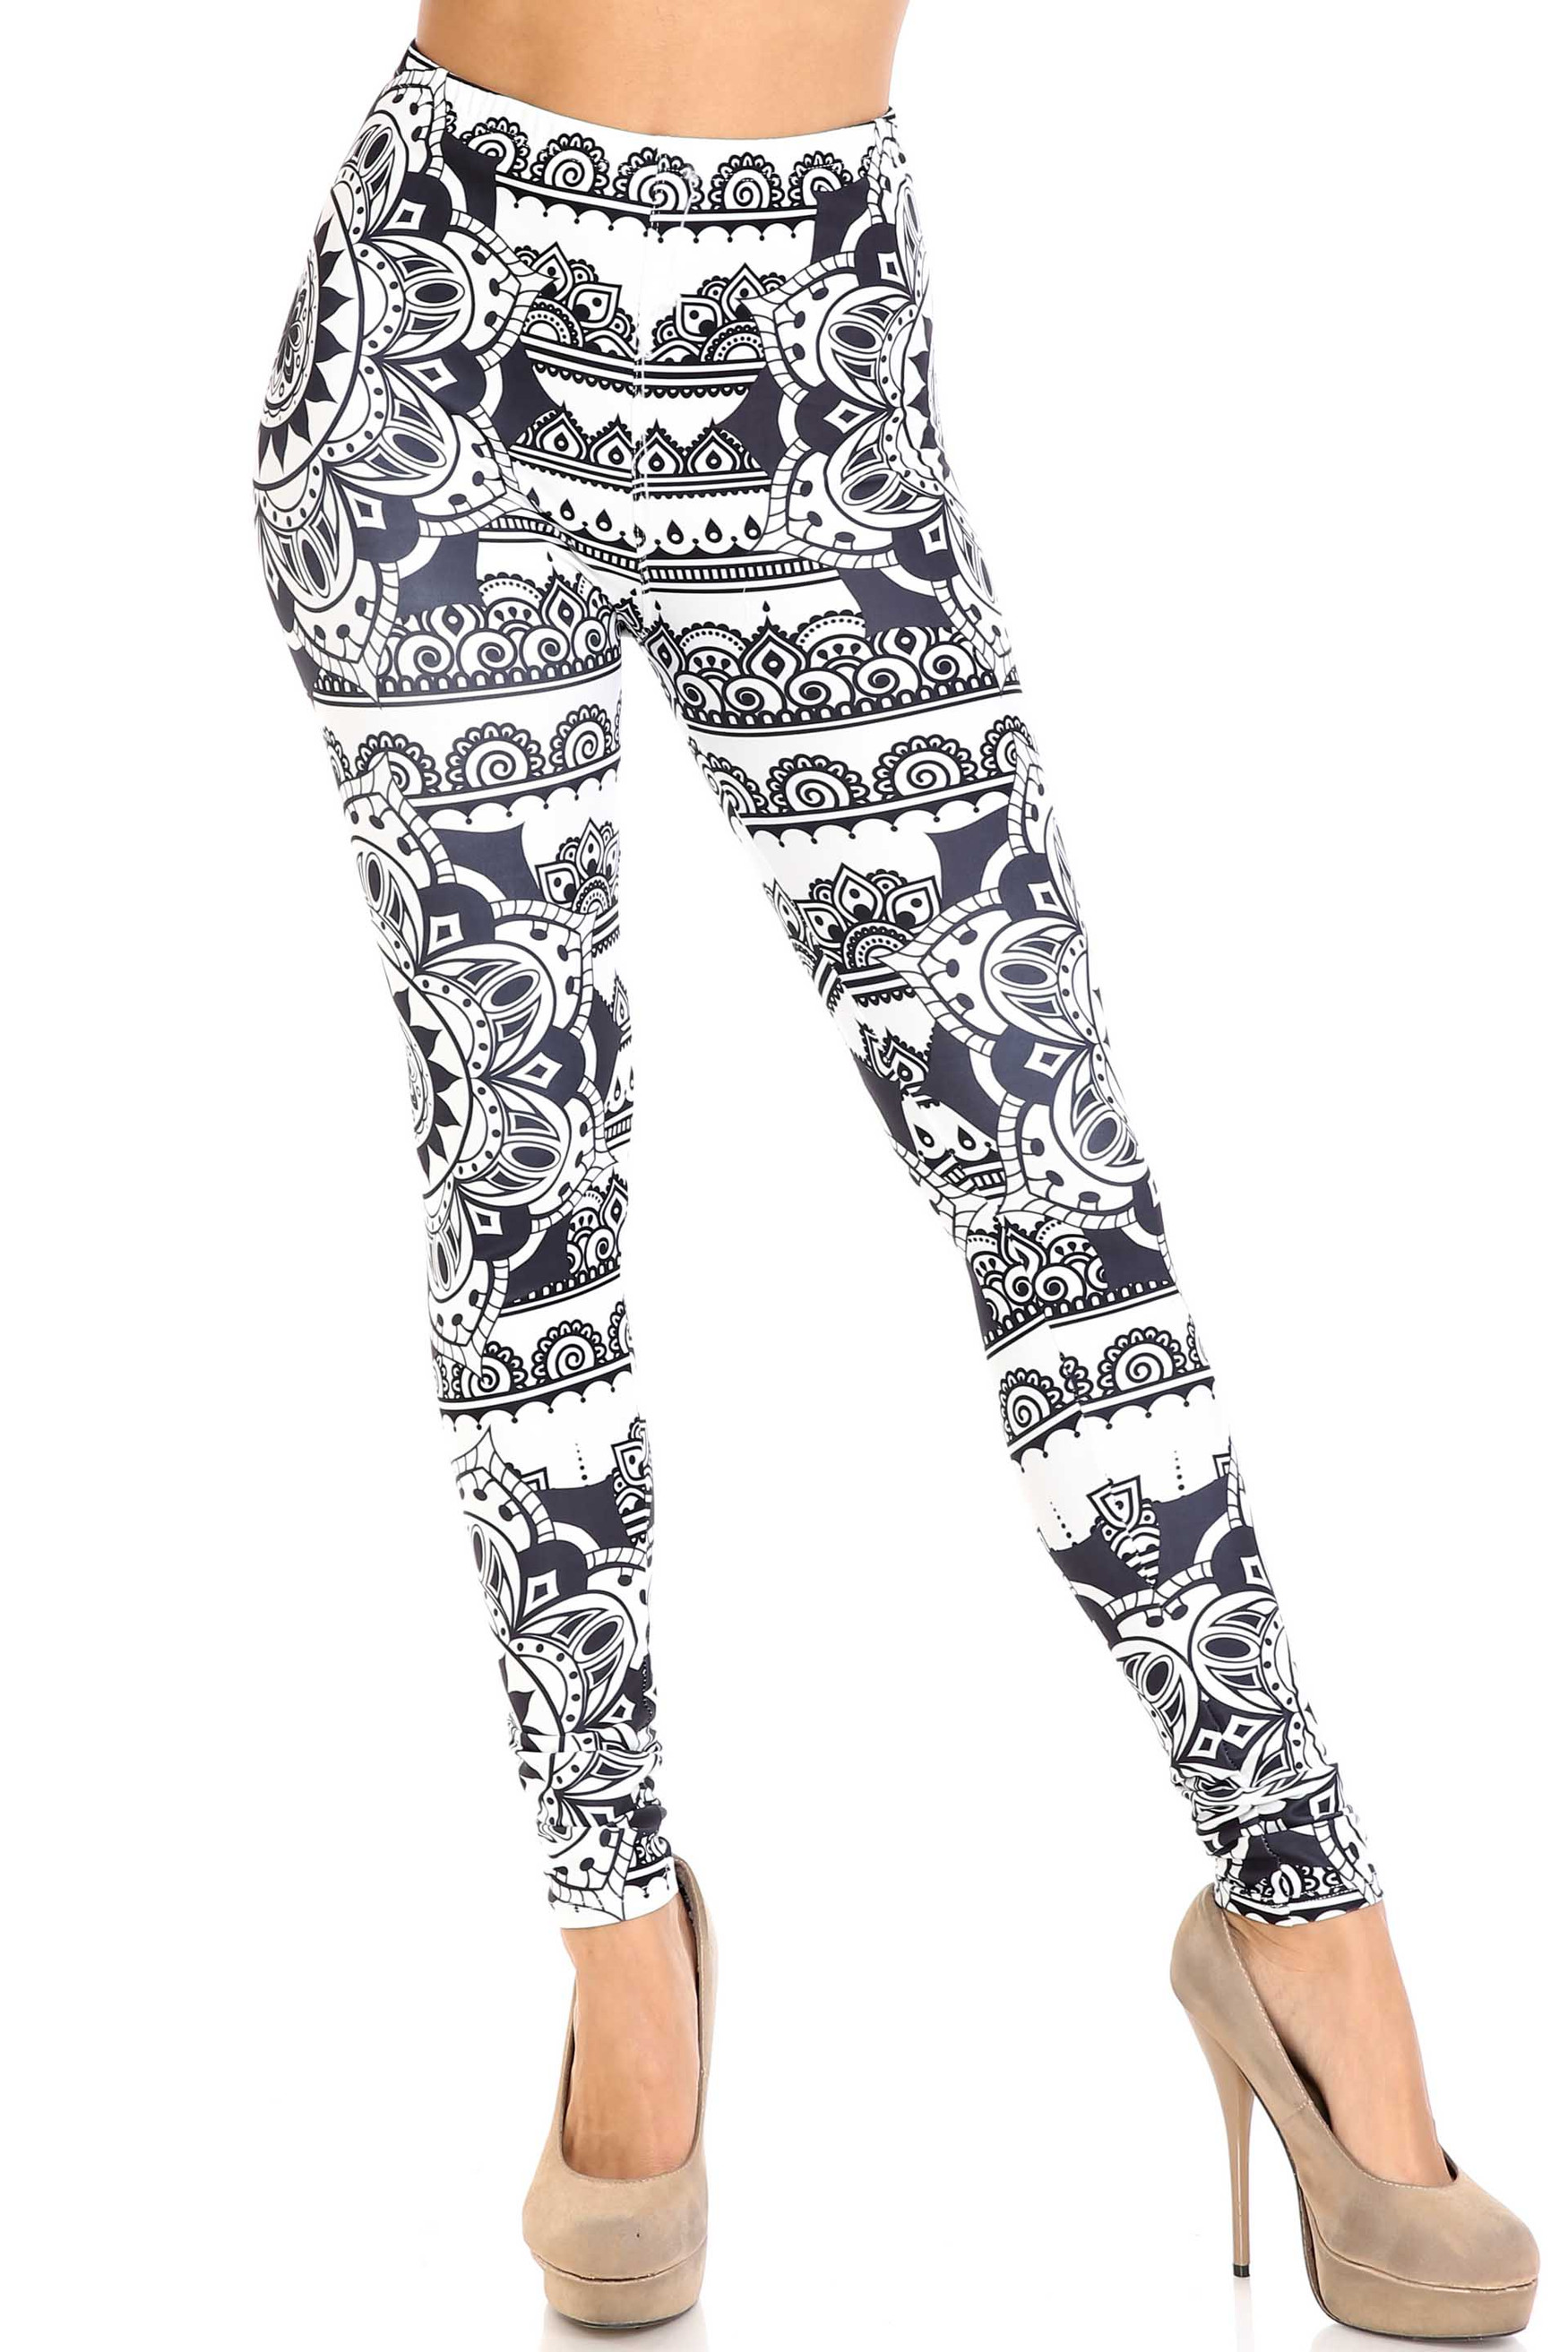 Creamy Soft Monochrome Mandala Extra Plus Size Leggings - 3X-5X - By USA Fashion™